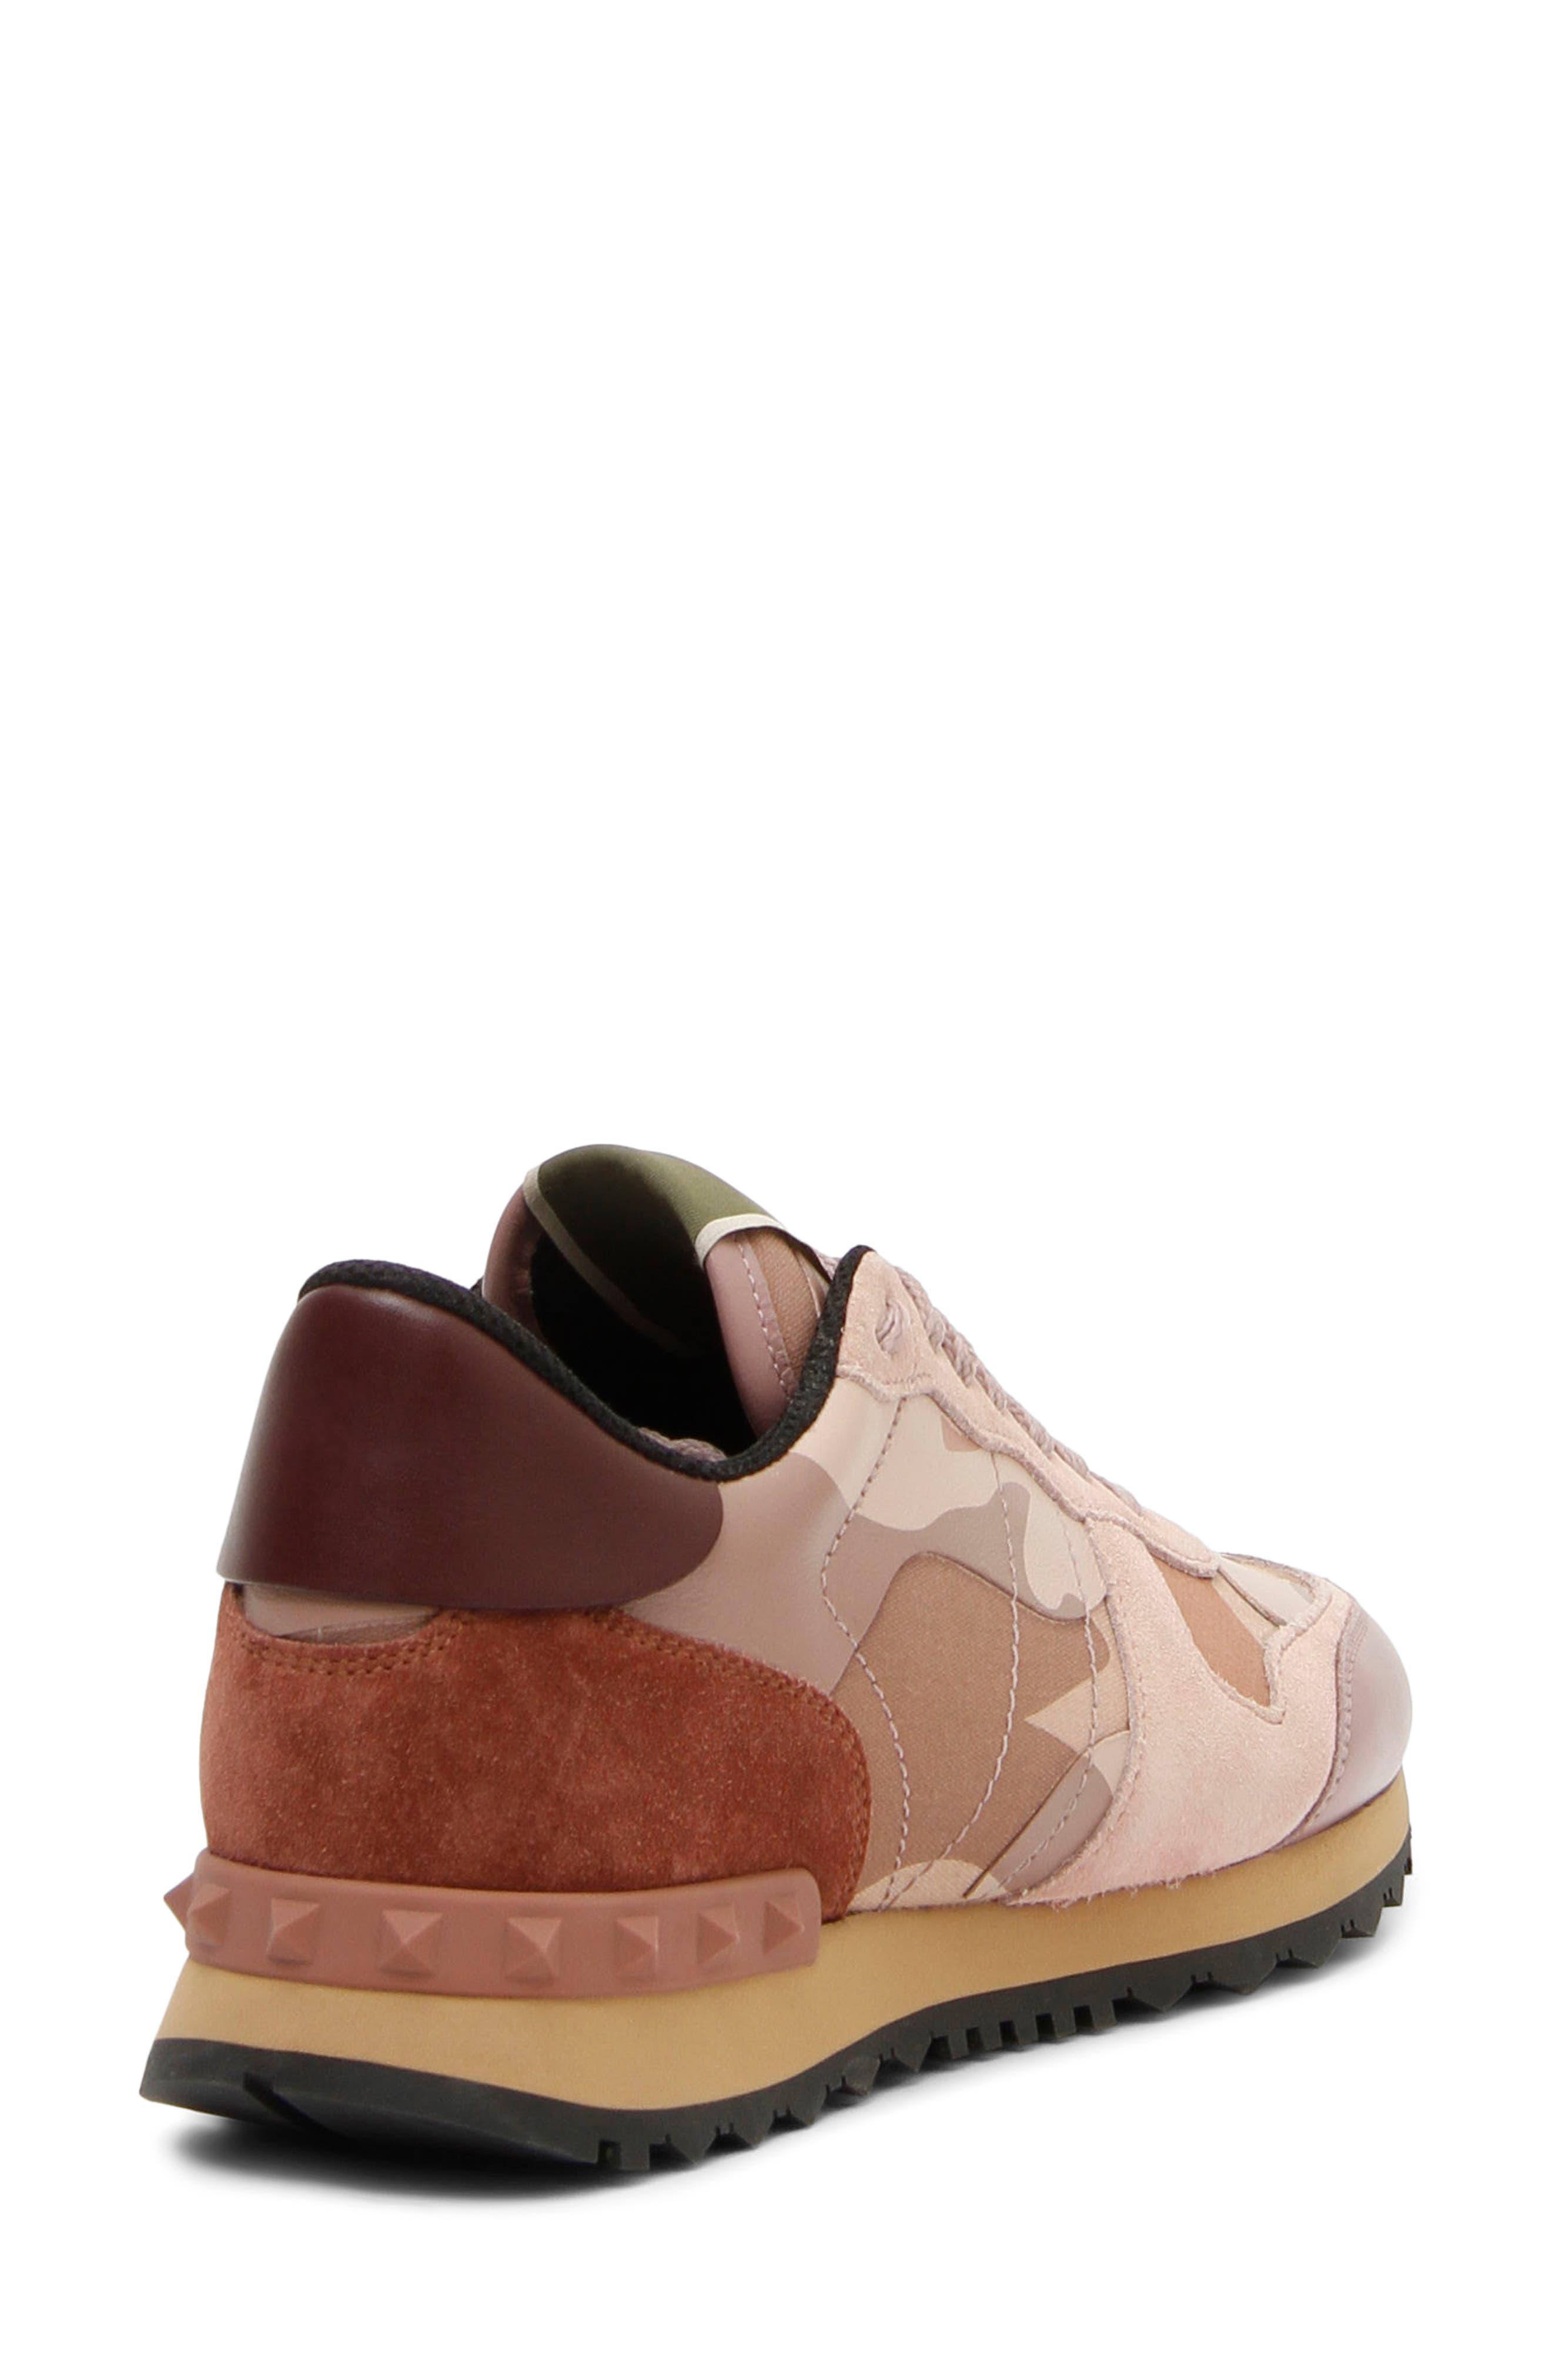 Rockstud Sneaker,                             Alternate thumbnail 3, color,                             Poudre/ Rose